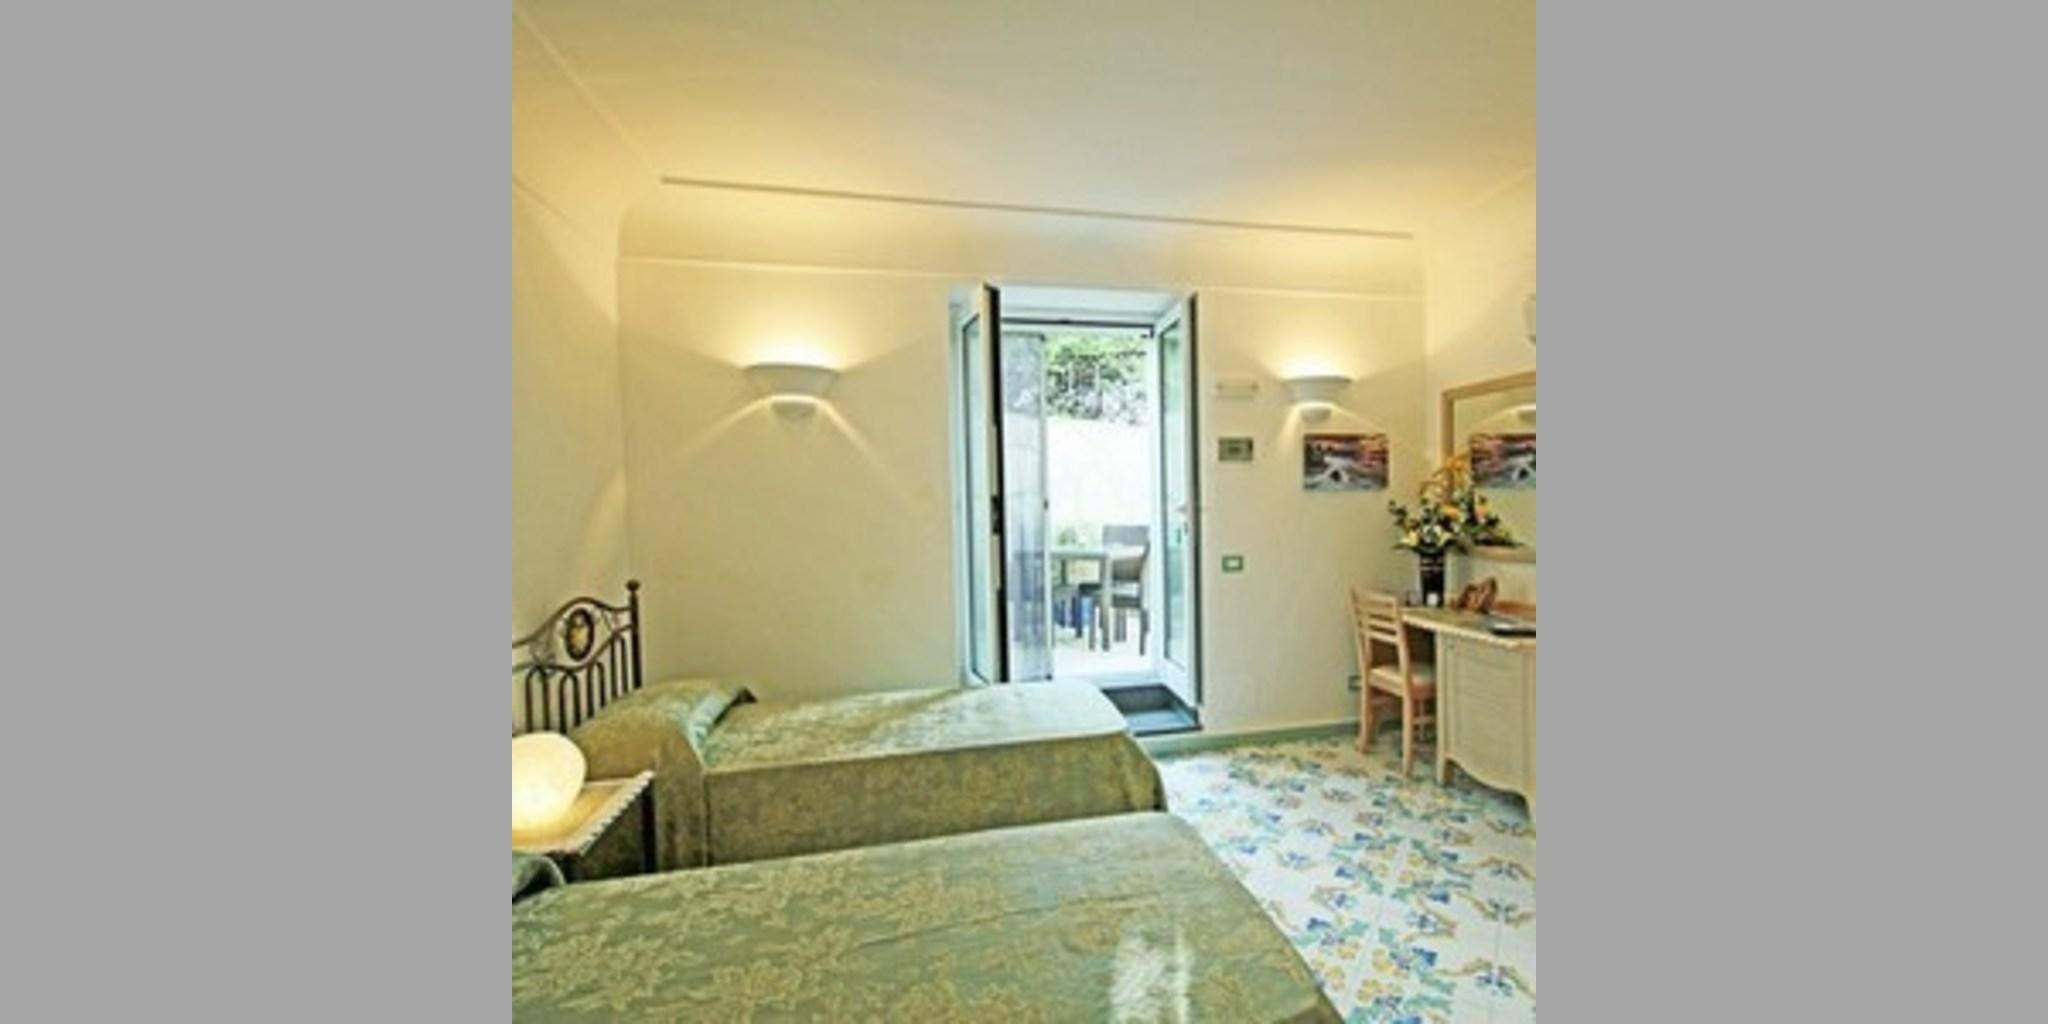 Bed & Breakfast Anacapri - Anacapri